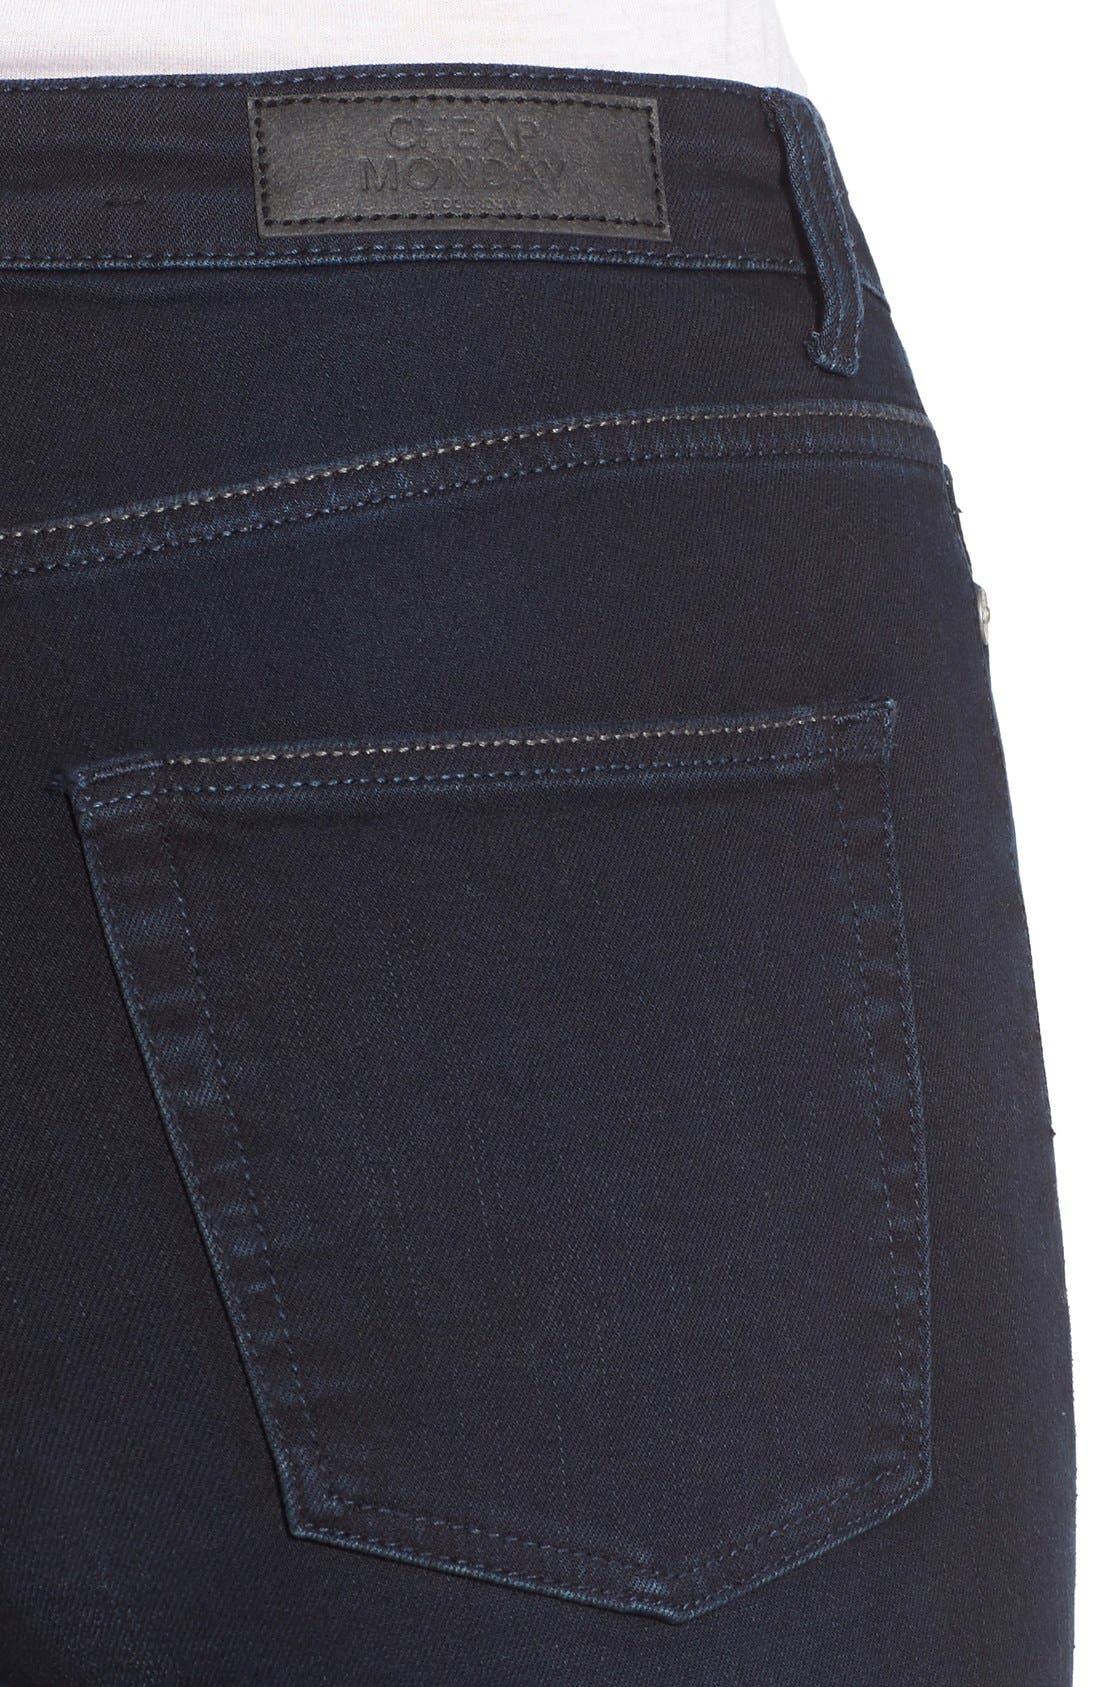 Alternate Image 4  - Cheap Monday High Rise Skinny Jeans (OD Blue)